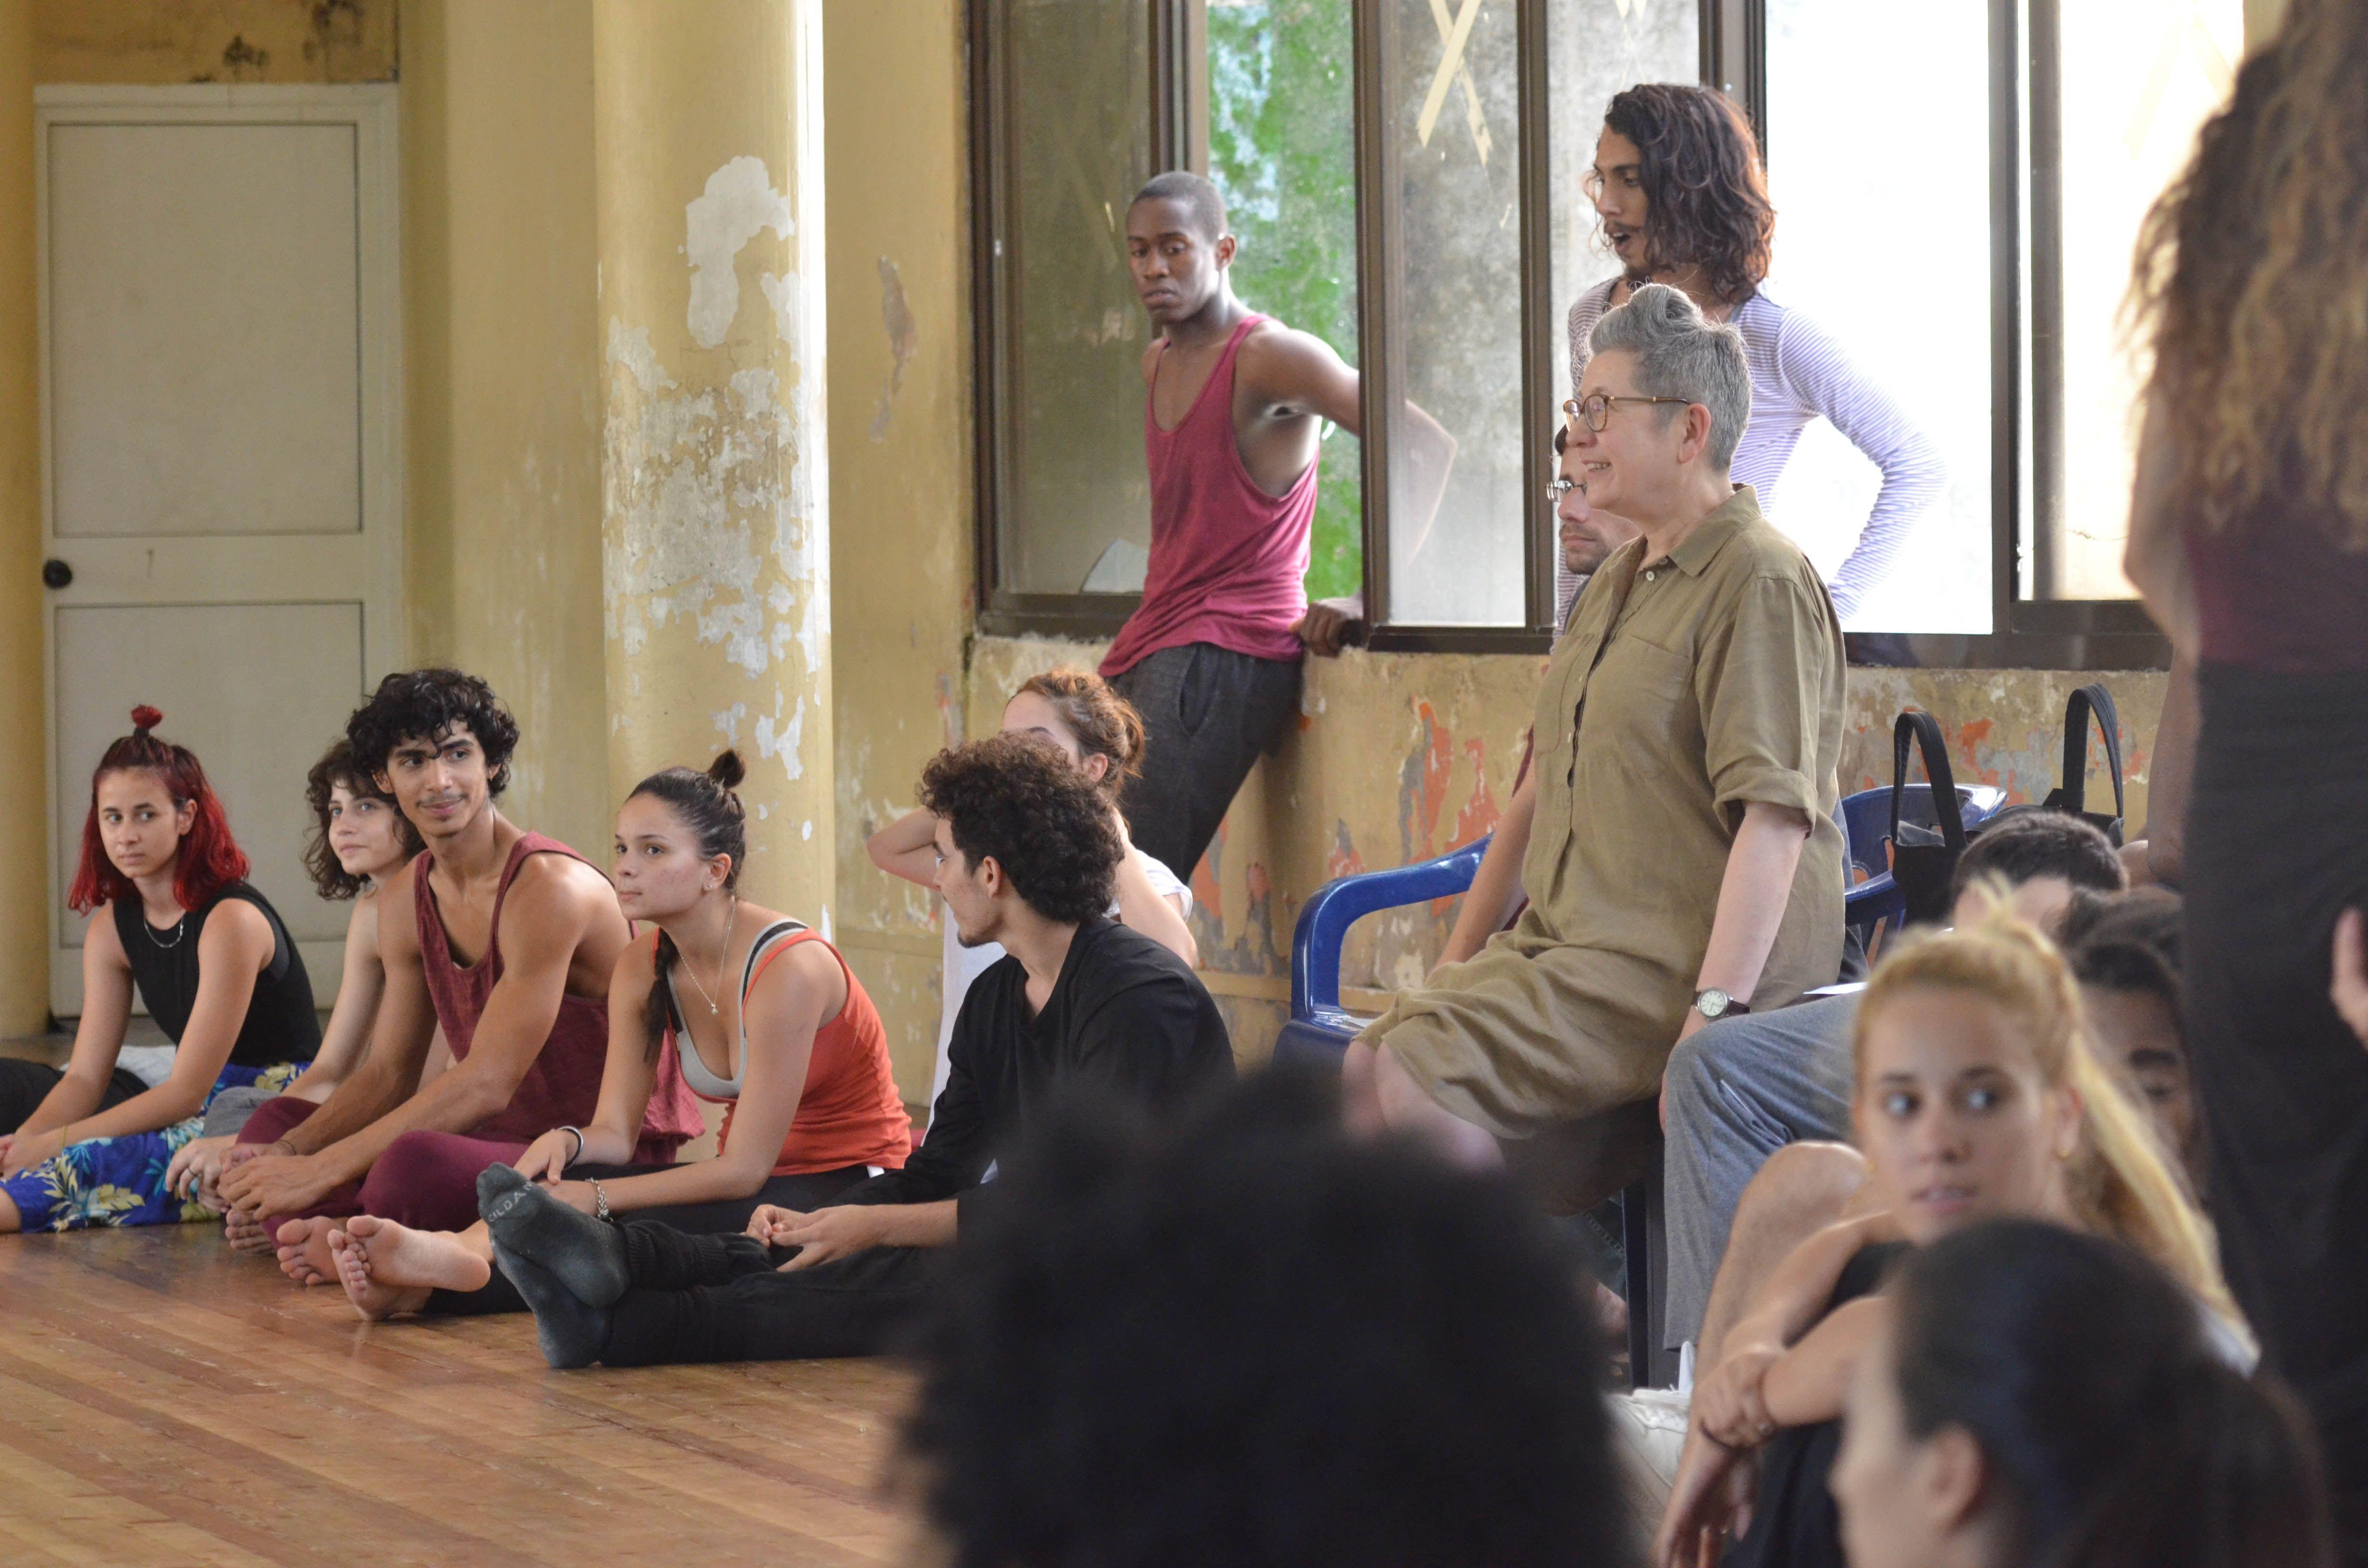 Bailarines de Dana Contemporánea de Cuba junto a la coreógrafa británica Lea Anderson. Foto: Adolfo Izquierdo.